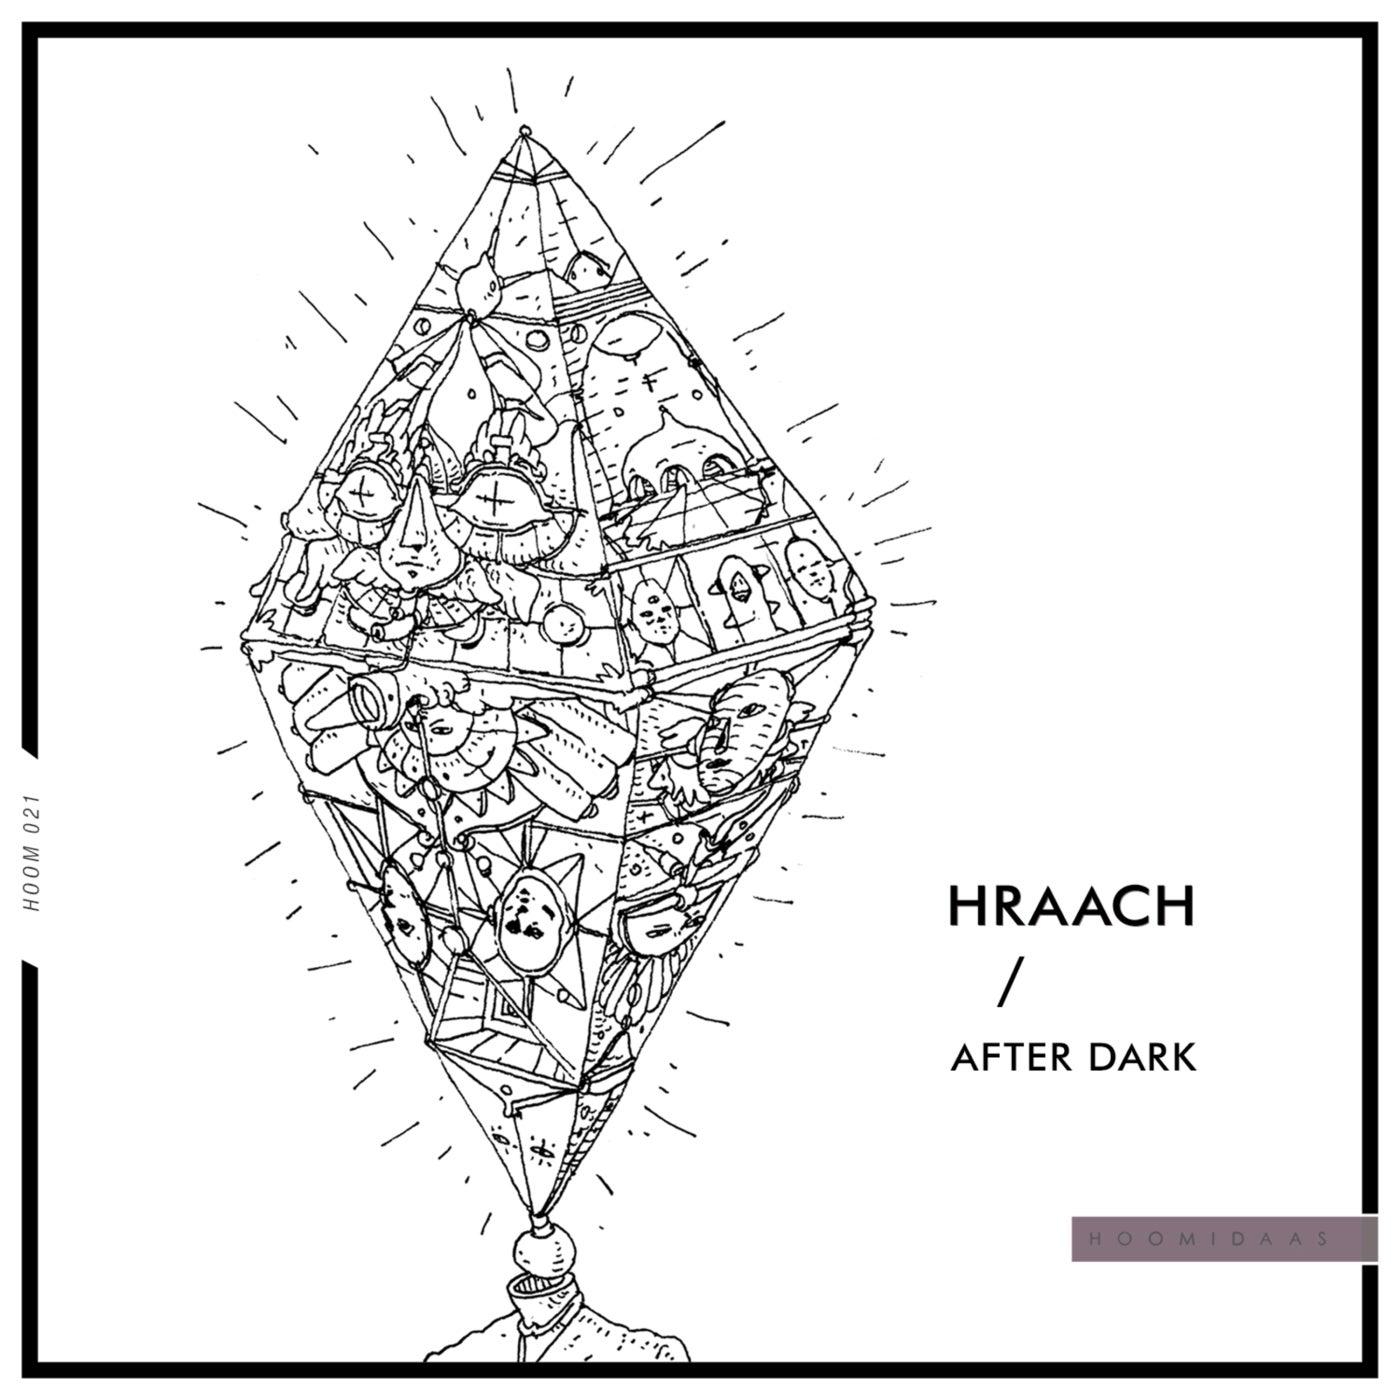 After Dark (Original Mix)